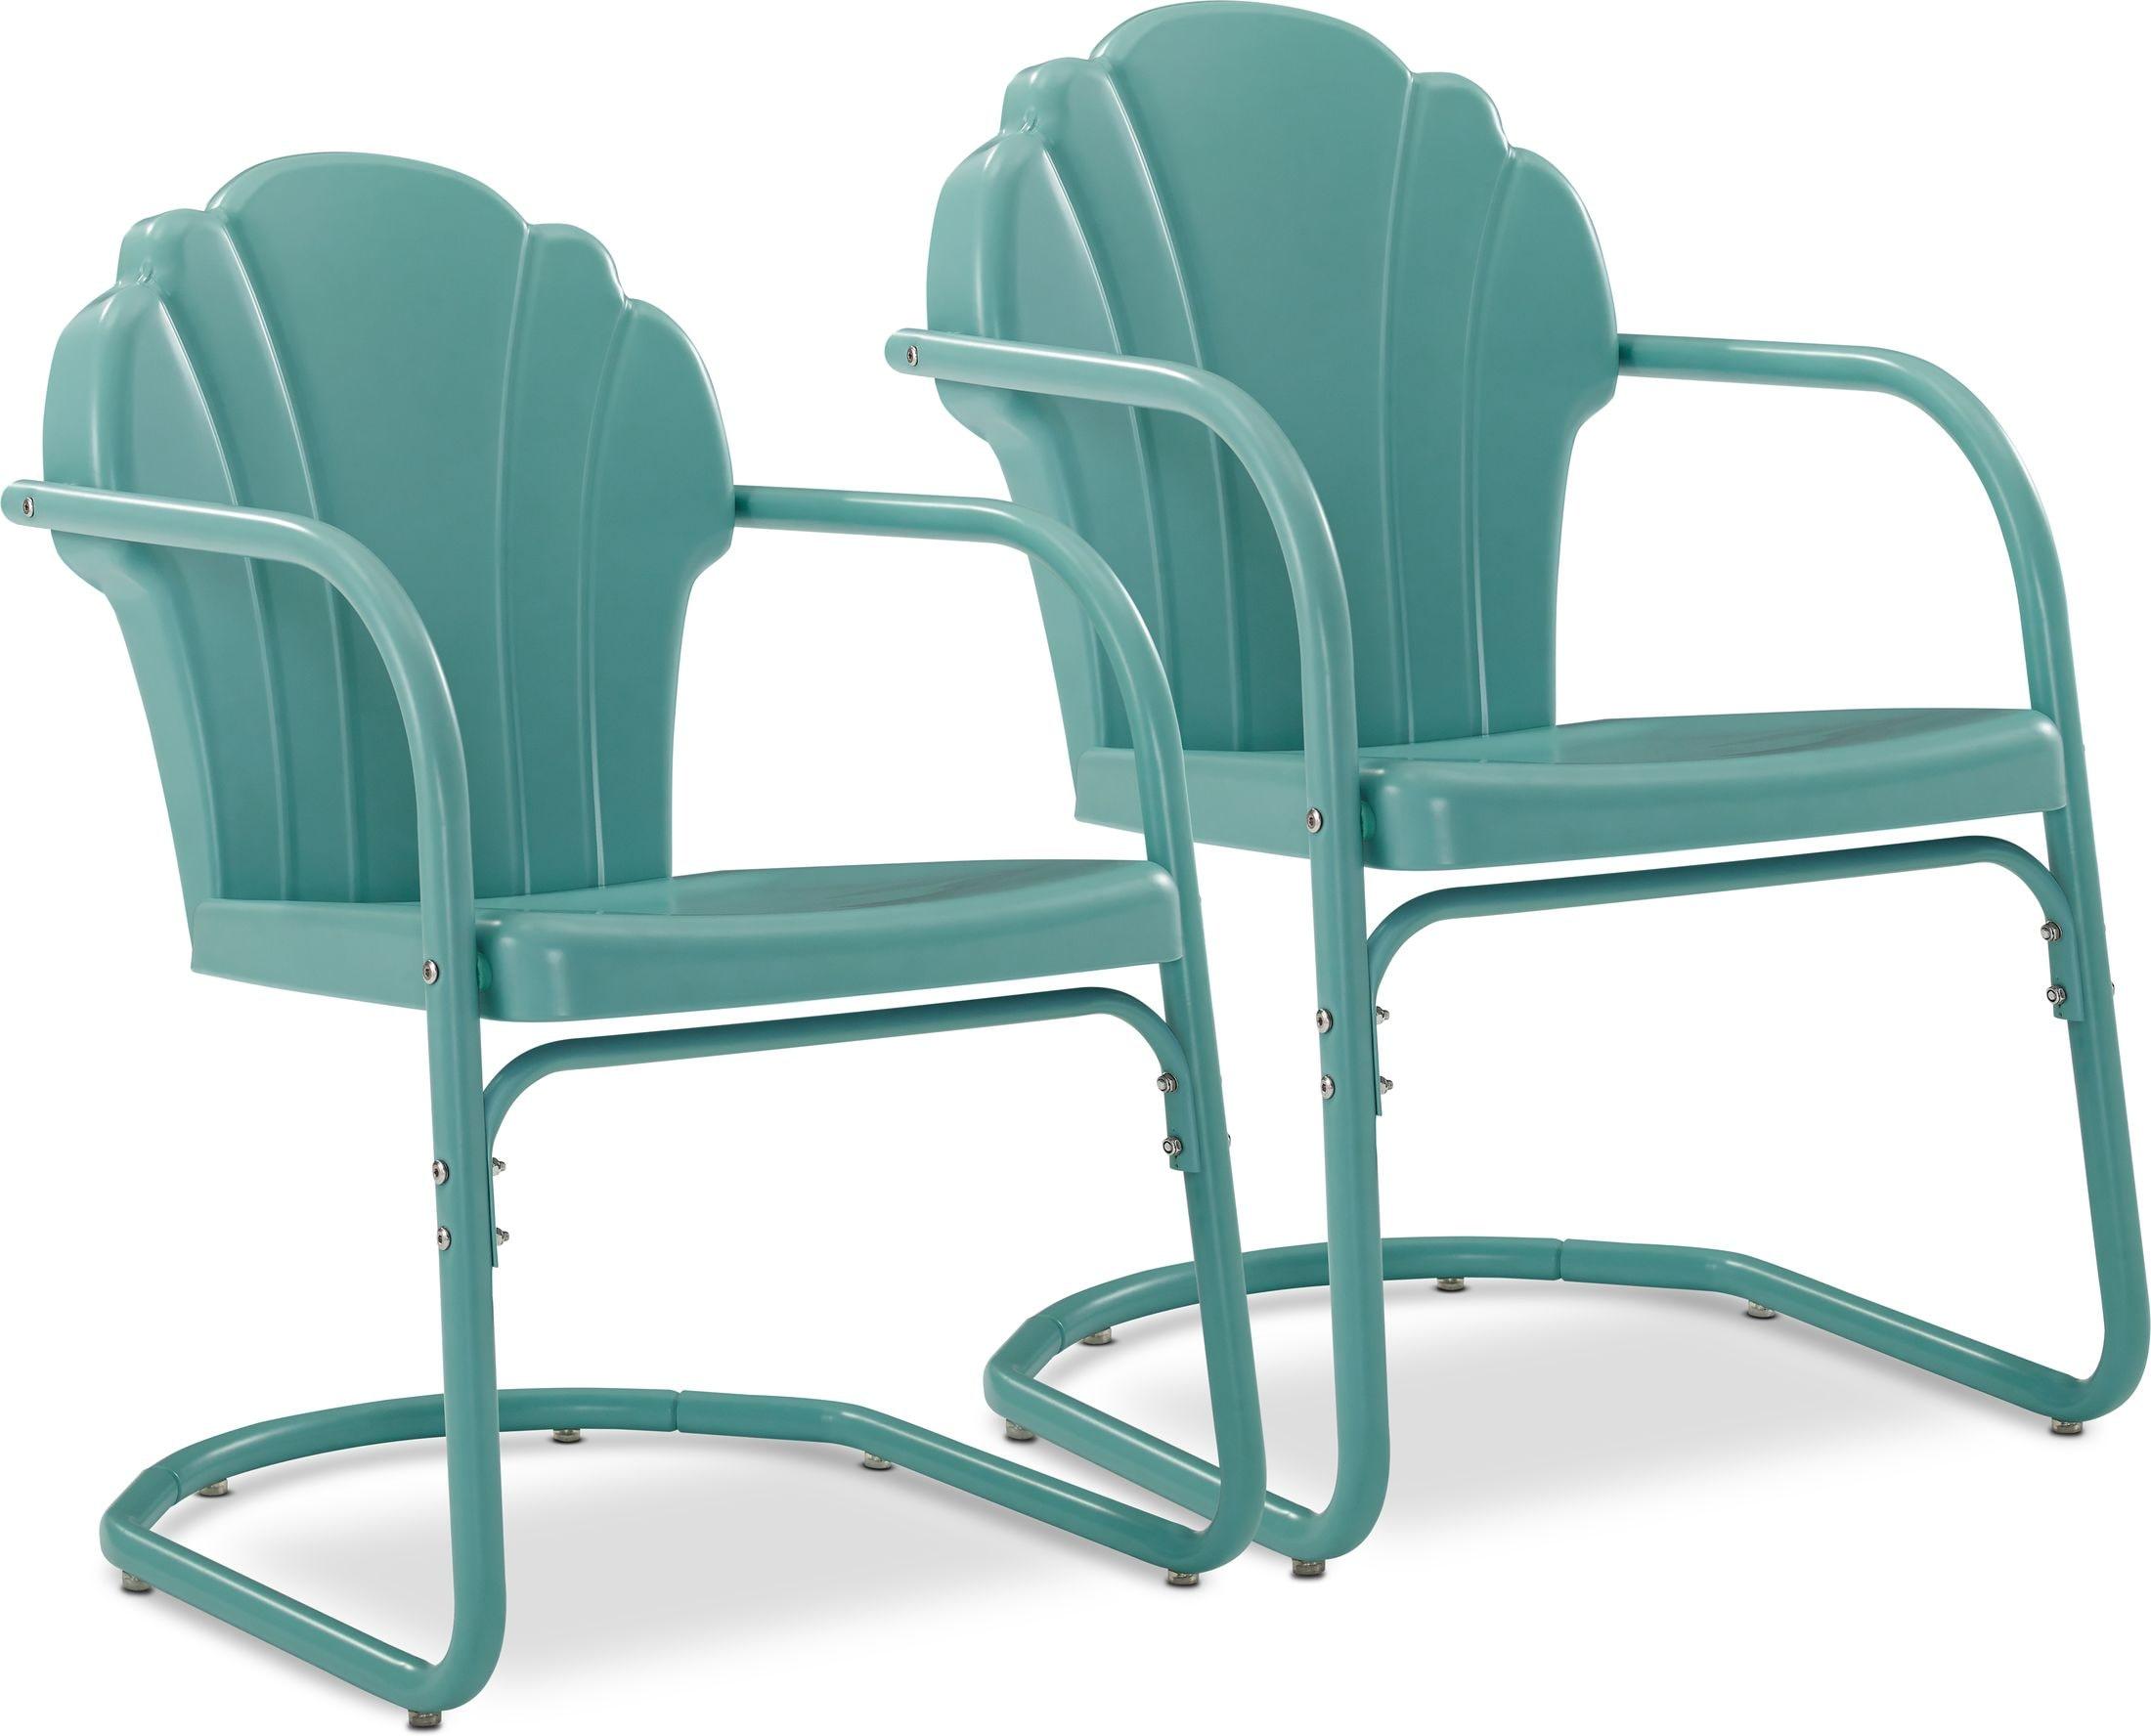 Outdoor Furniture - Petal Retro Set of 2 Outdoor Chairs